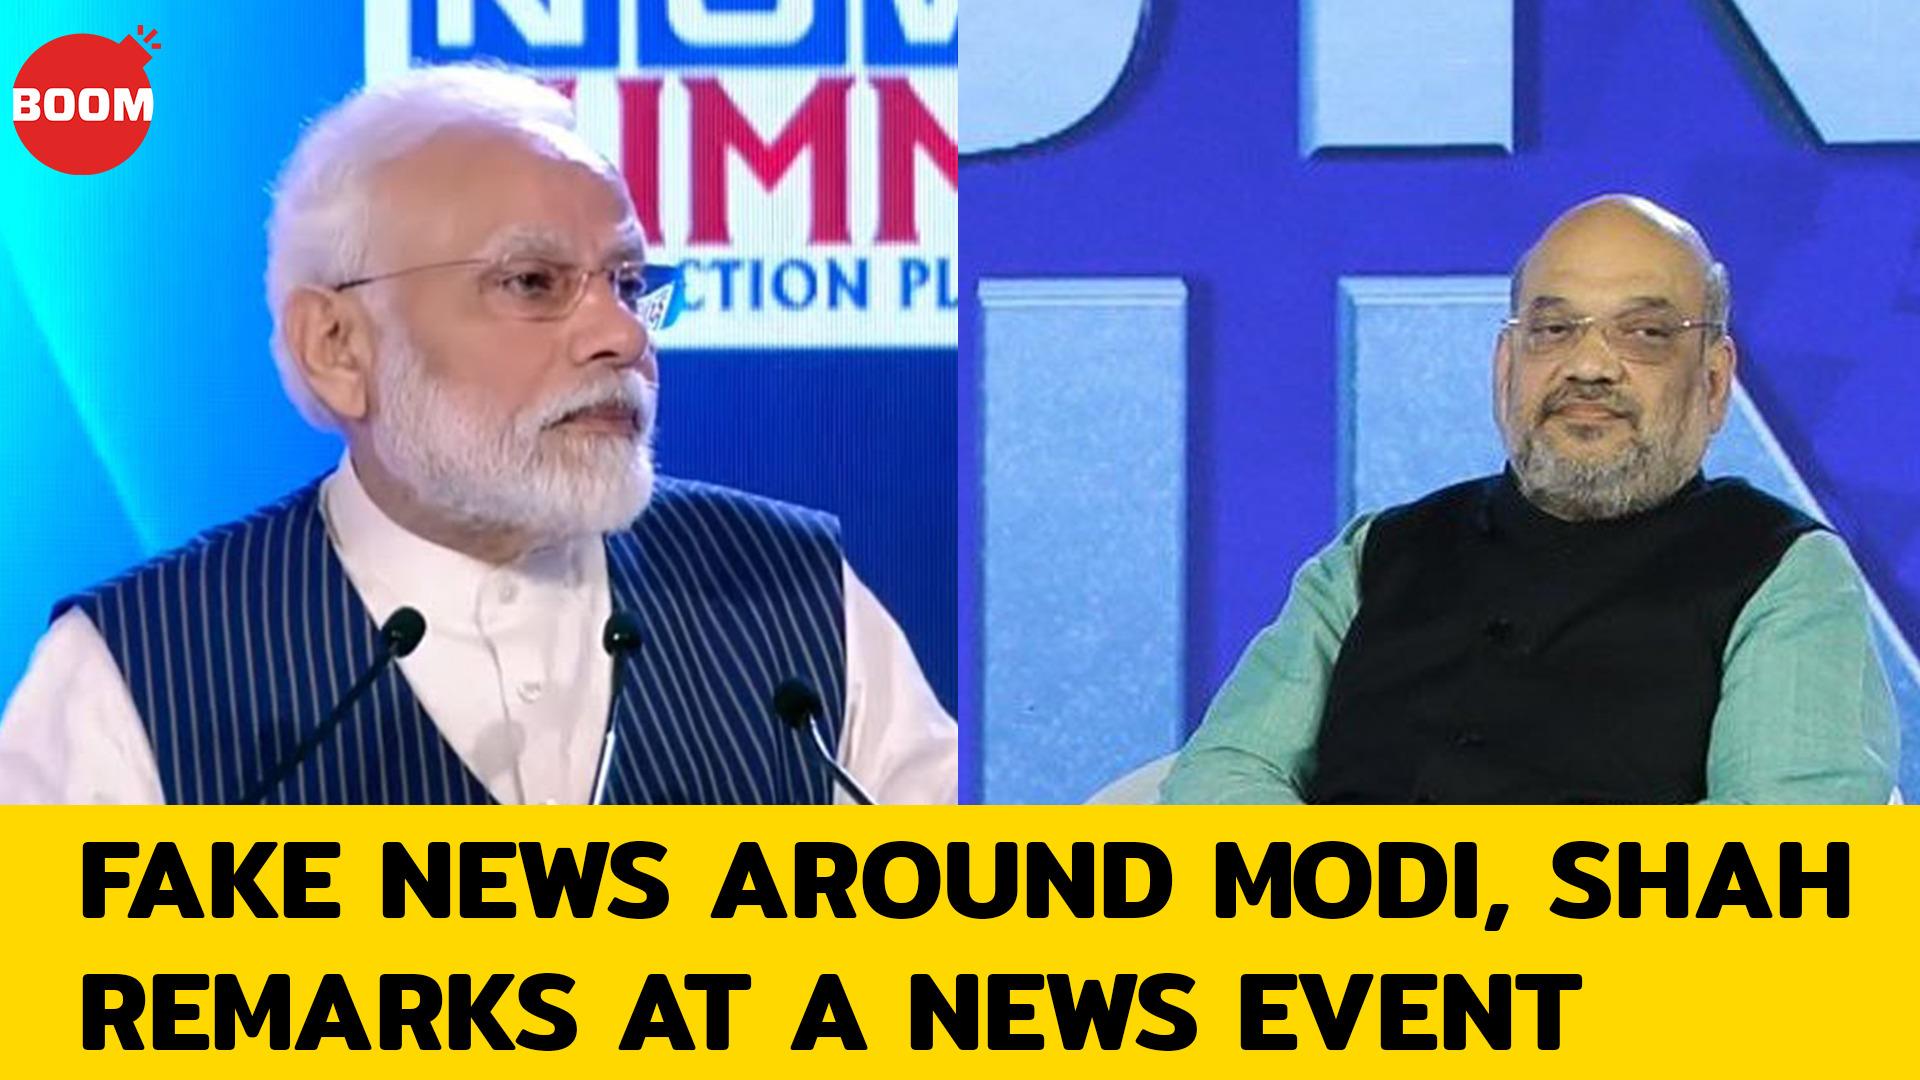 Fake News Around Modi, Shah Remarks At A News Event